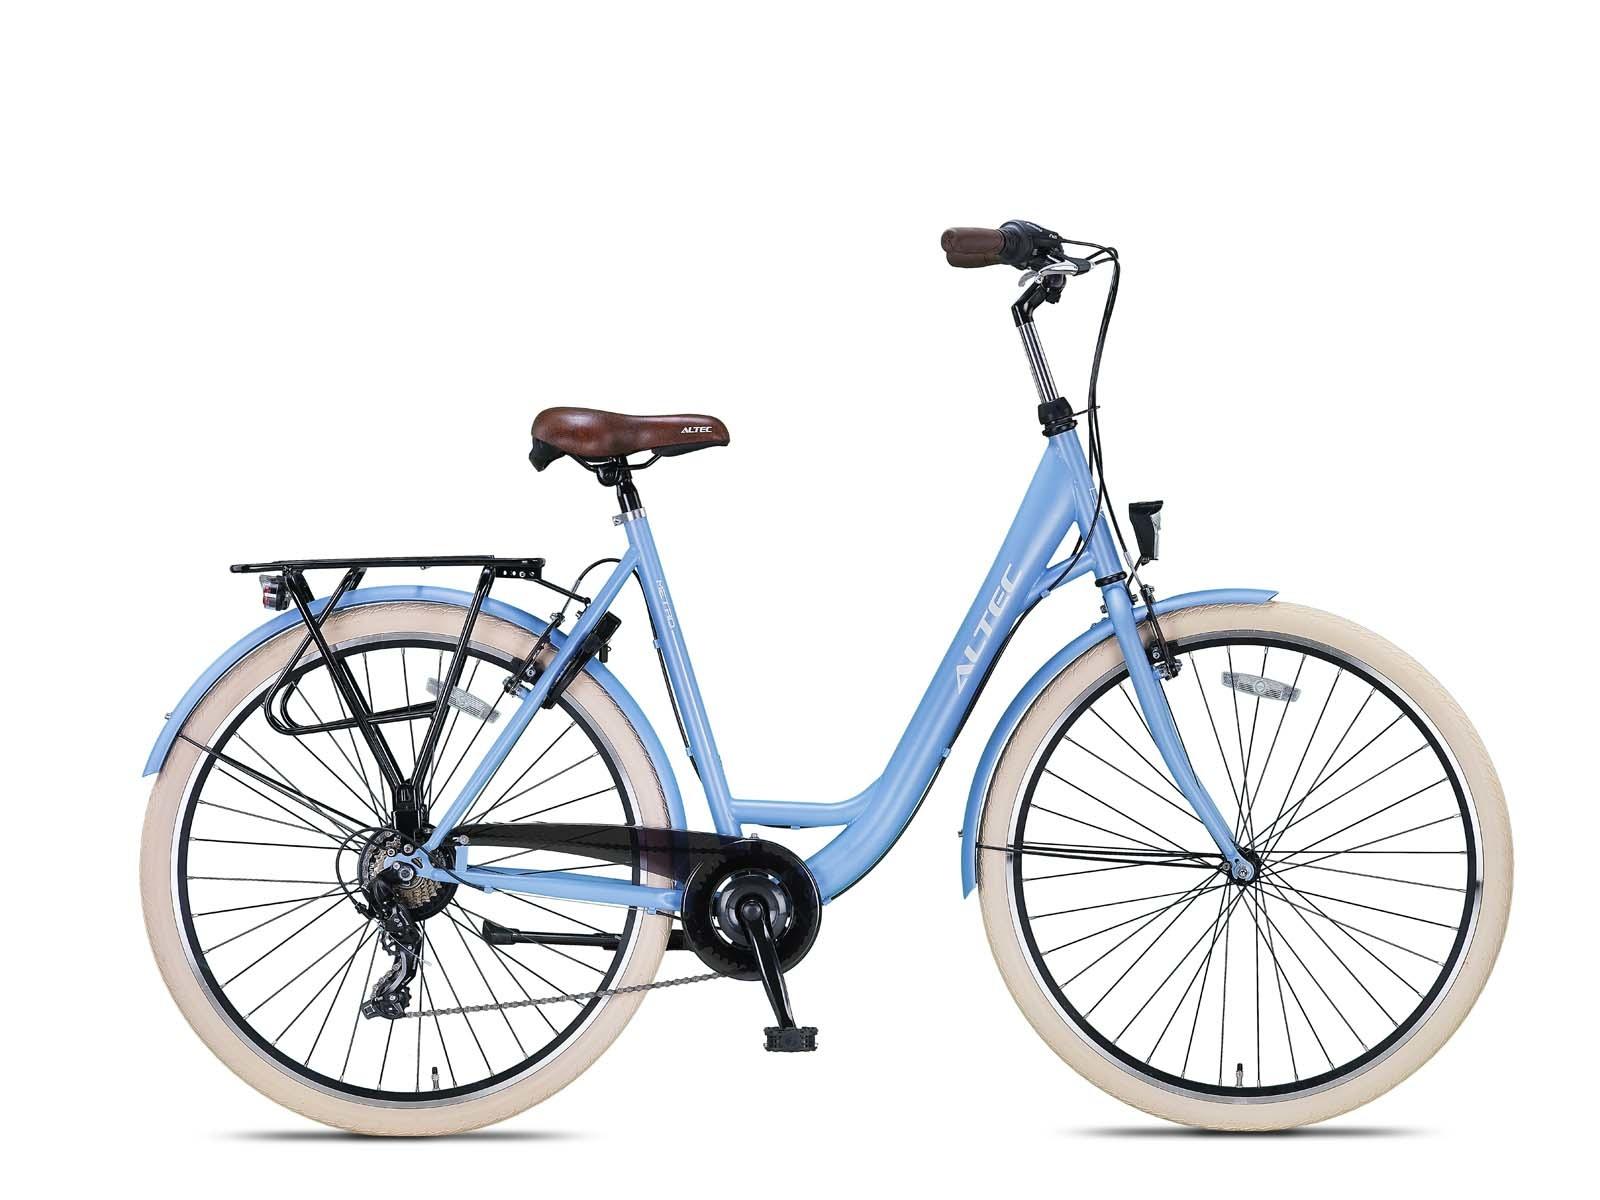 Altec Metro Plus 28inch Damesfiets 49cm Frozen Blue 7v online kopen